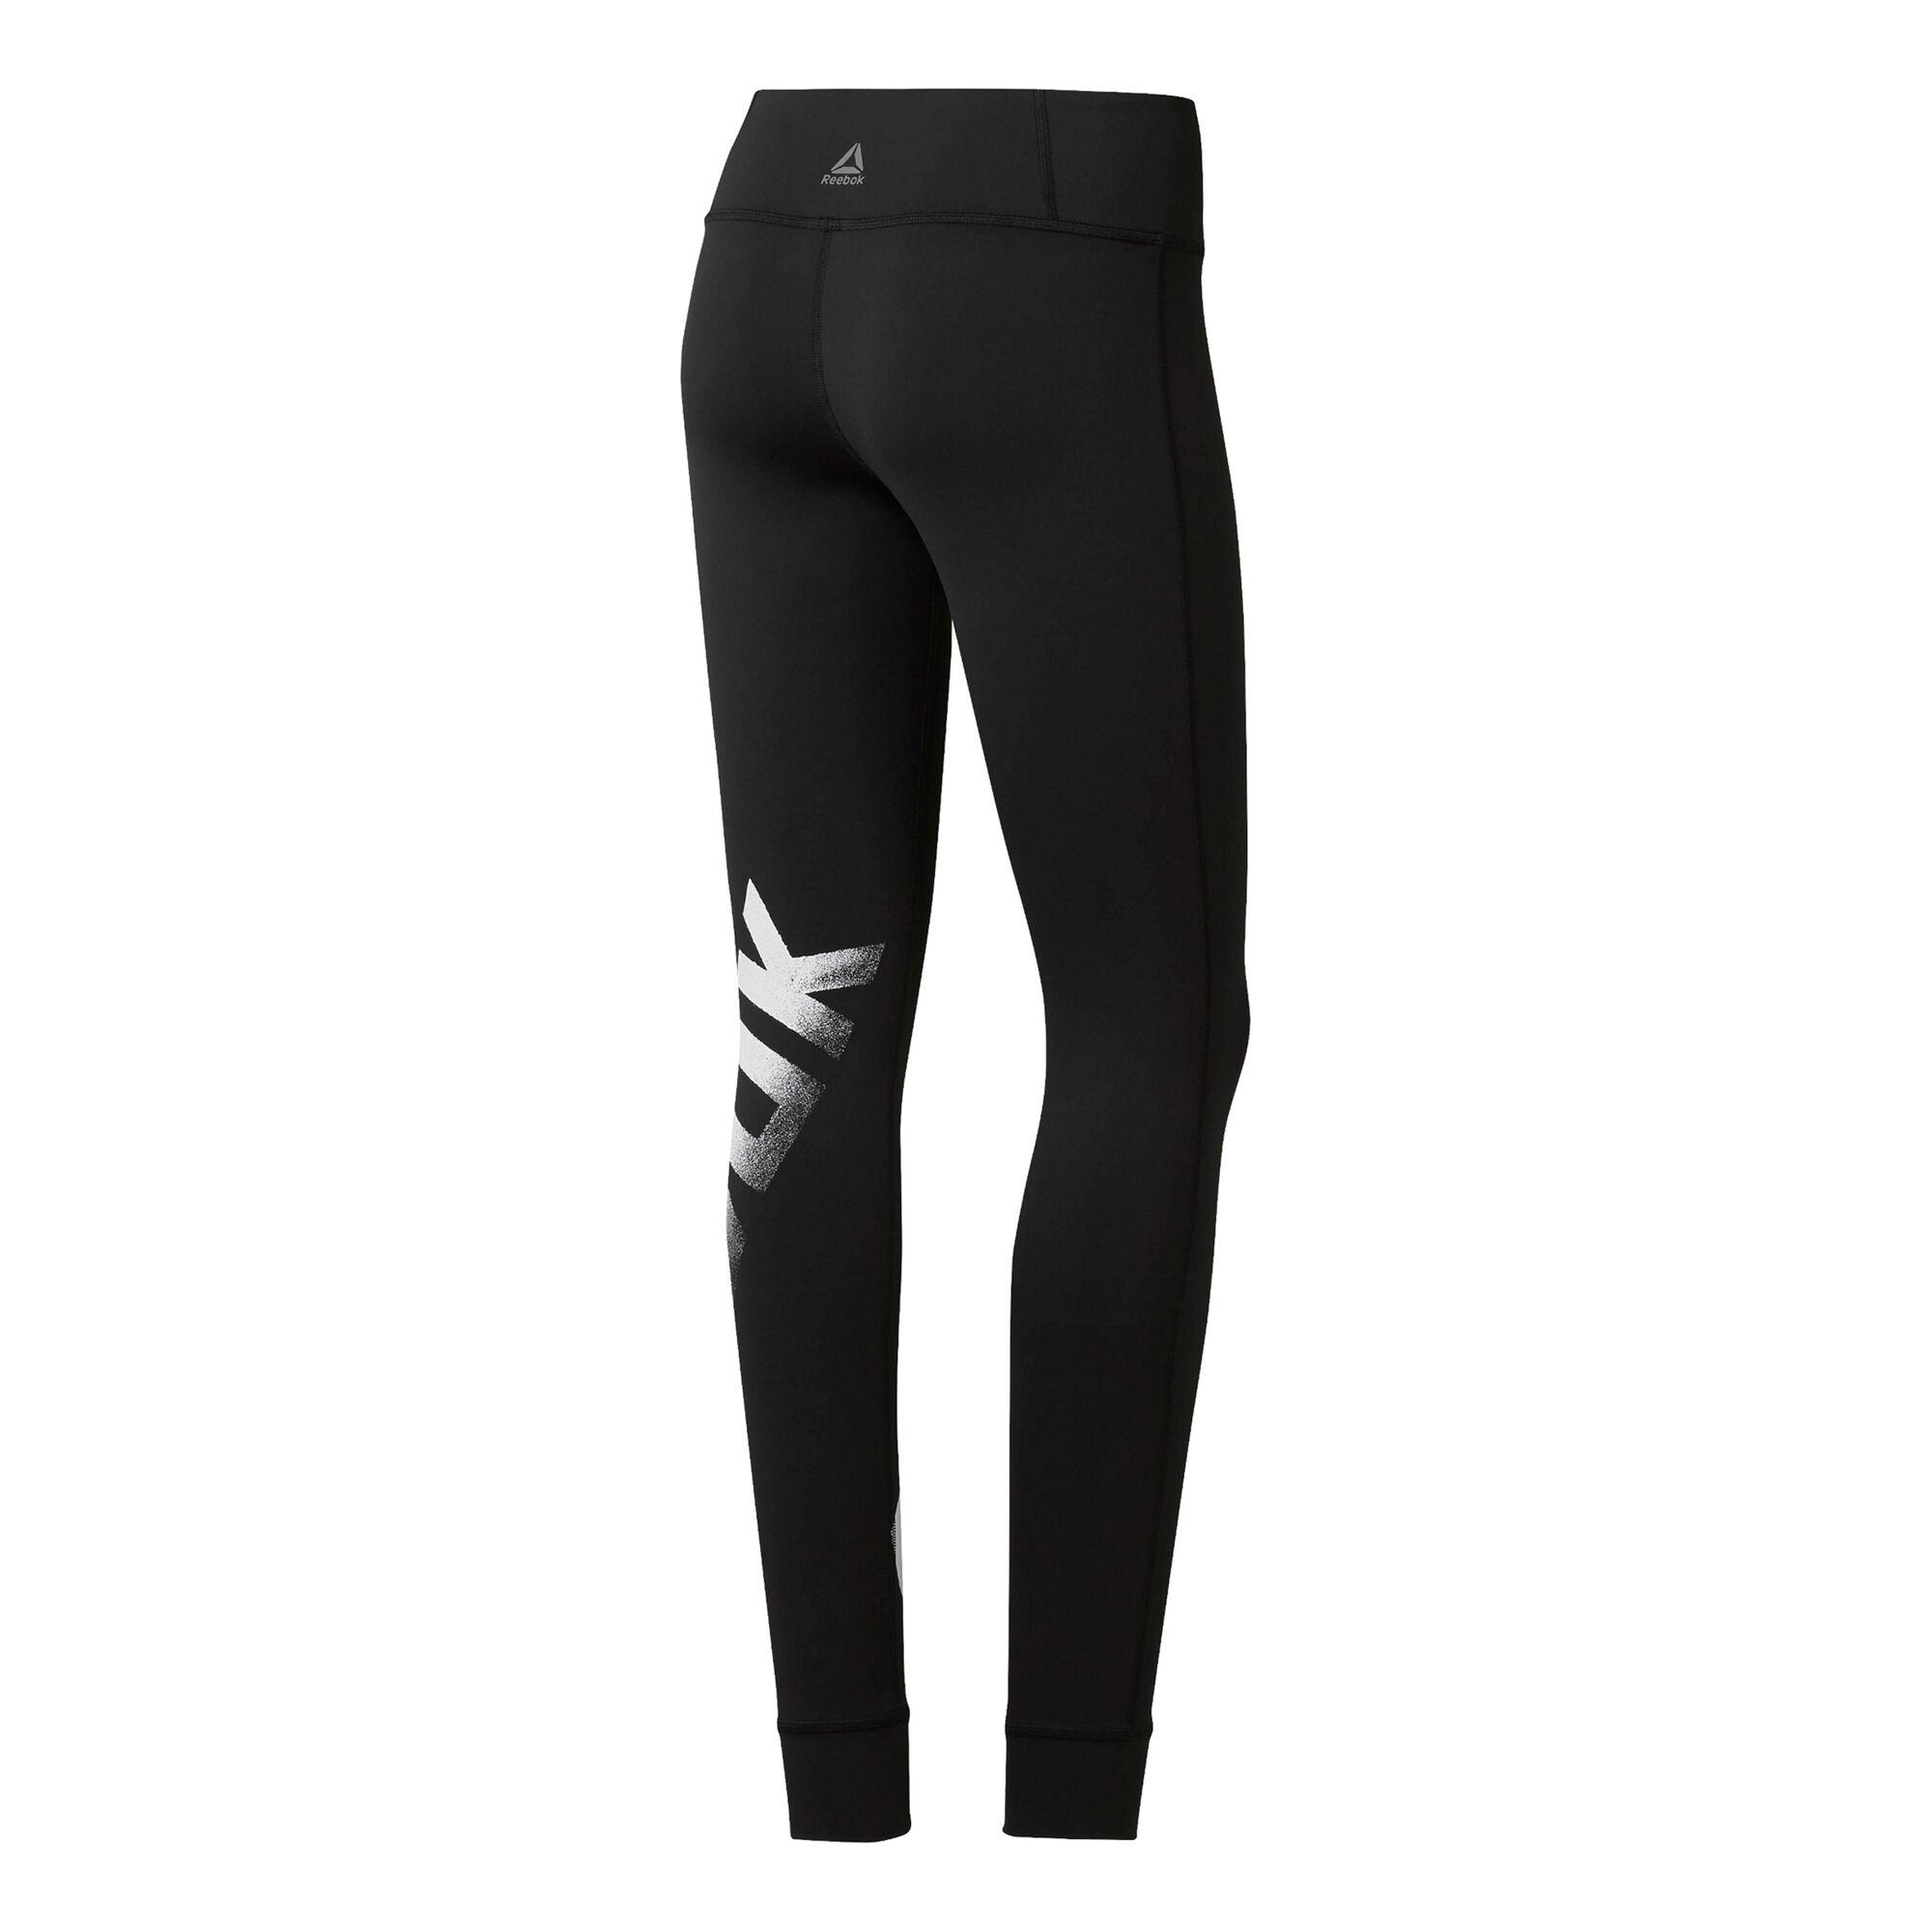 f7dc02261f888 buy Reebok Cardio Lux Bold Tight Women - Black, White online ...